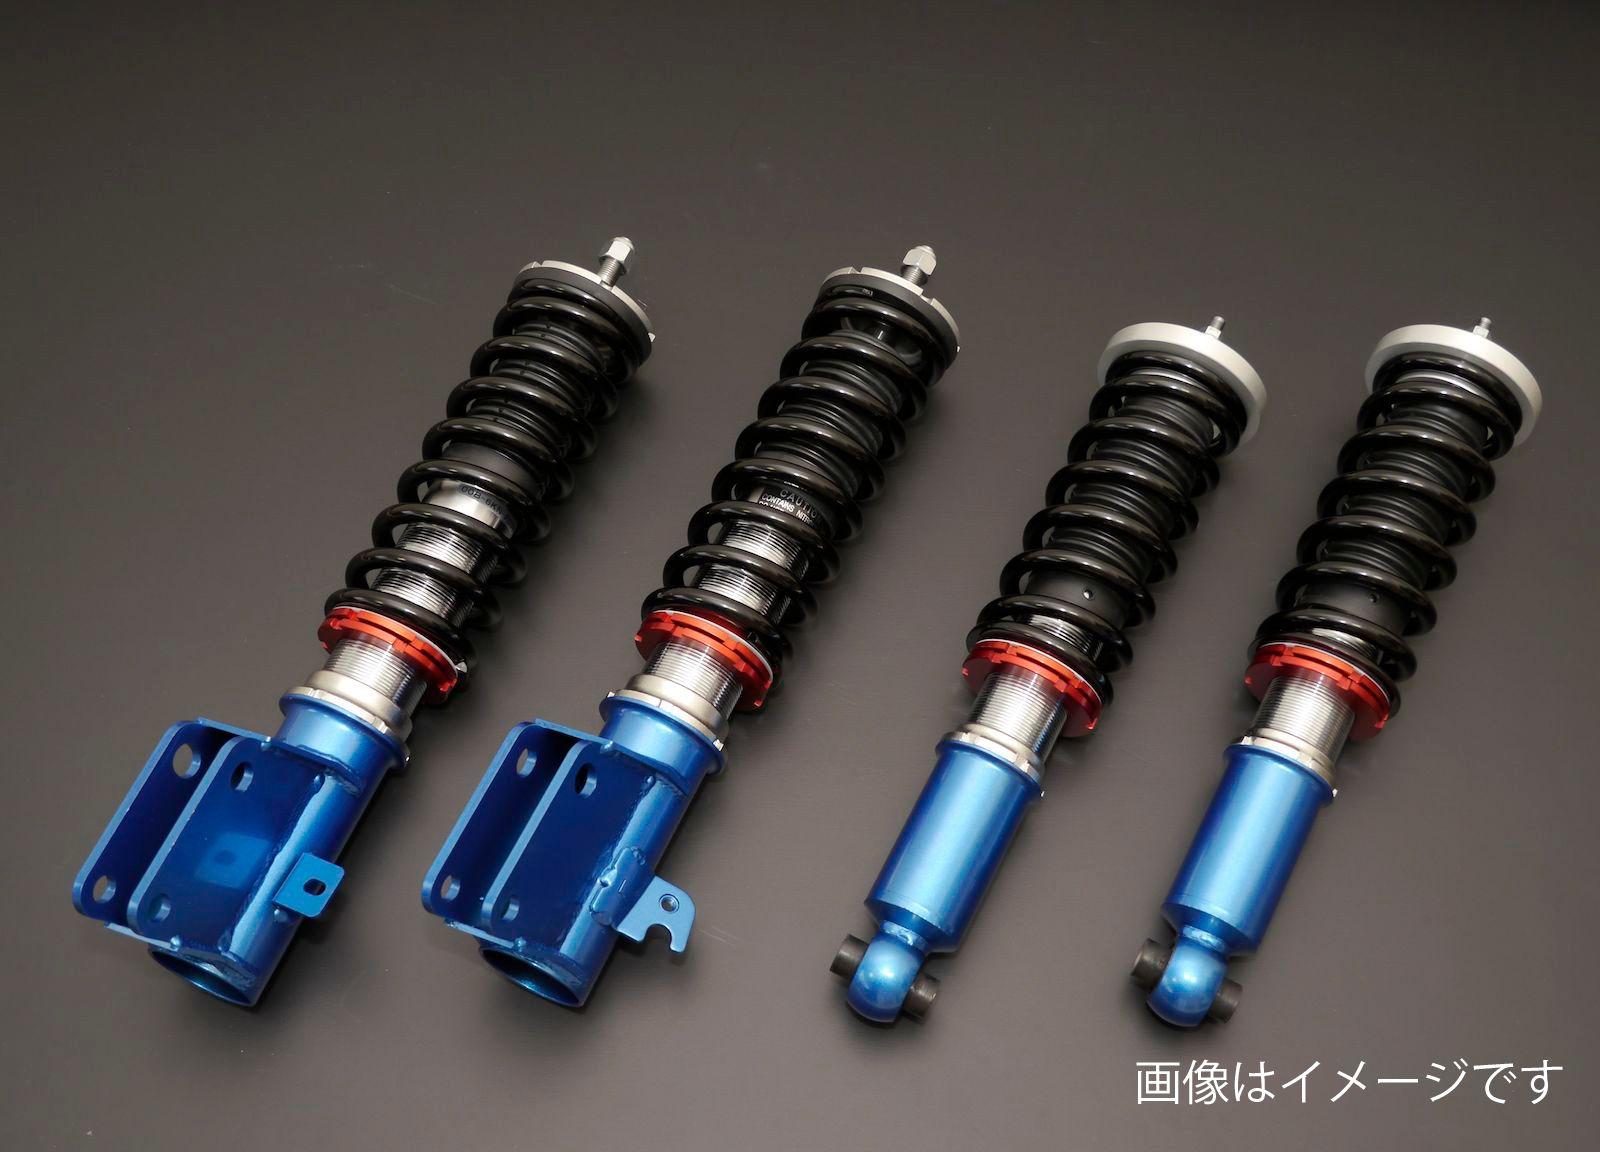 CUSCO(クスコ) 車高調キット street ZERO 日産 スカイライン CKV36 2007.10-2014.4 商品番号:288 61P CN